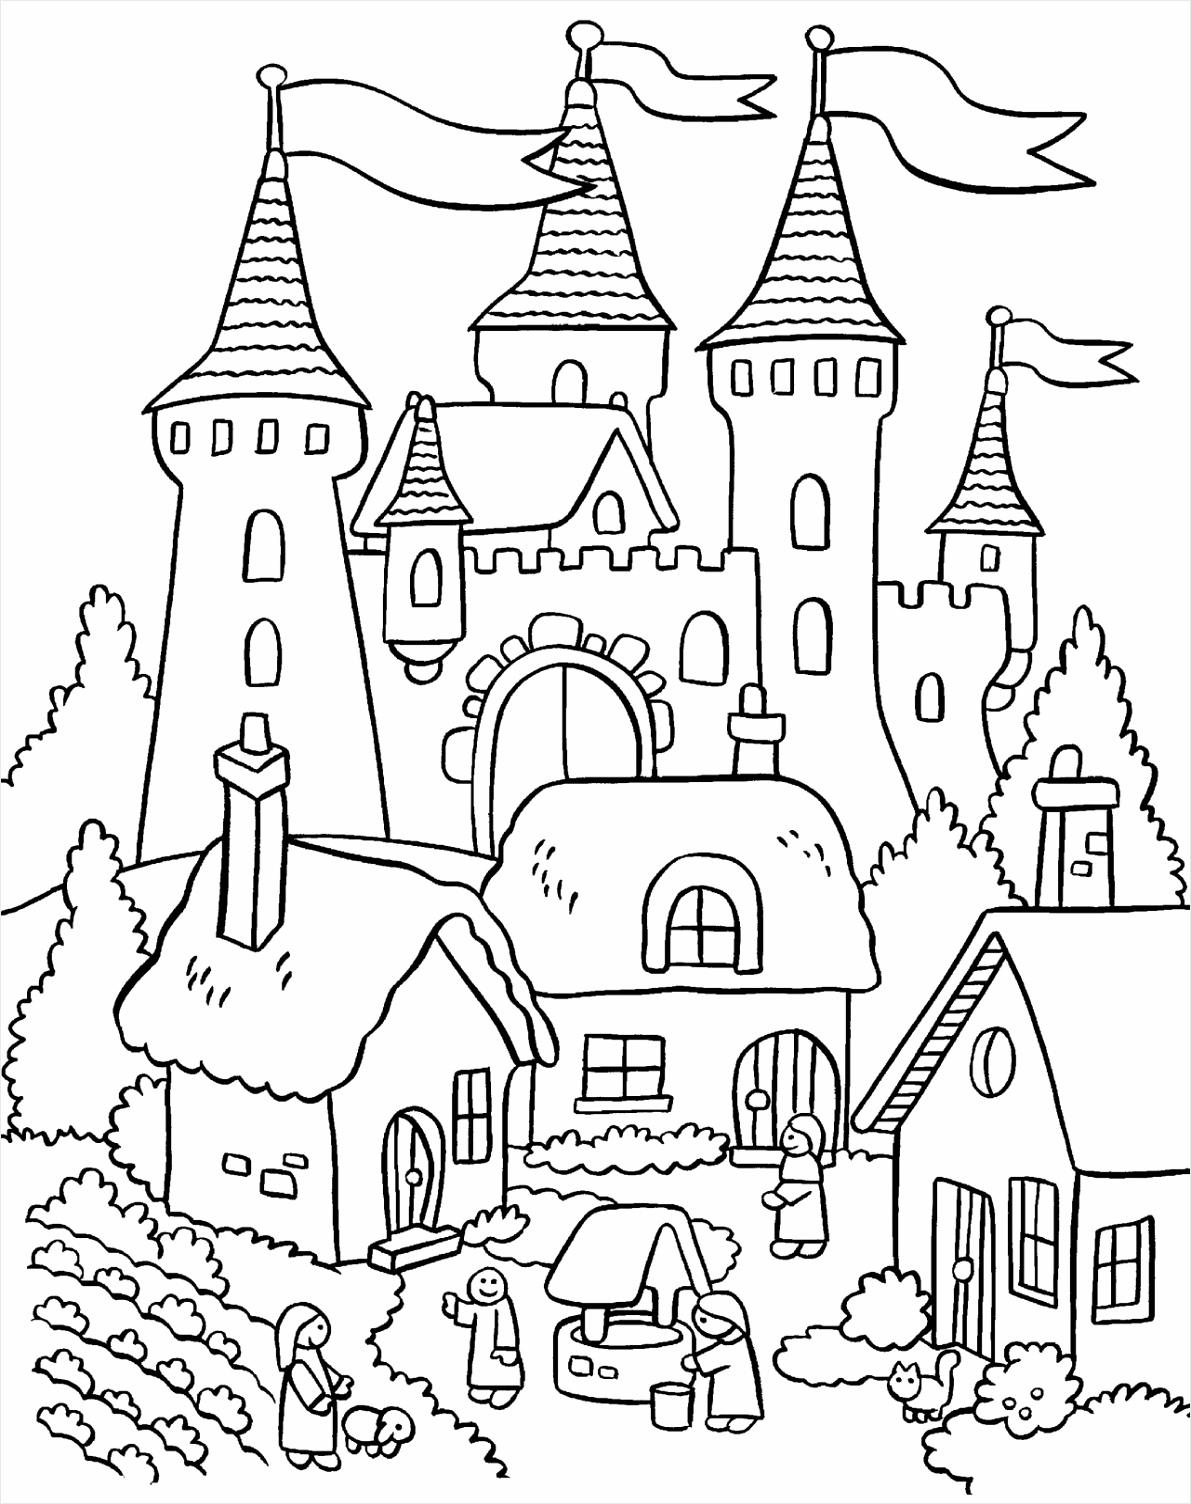 kleurplaat prinses kasteel kleurplaten234 kleurplaten234